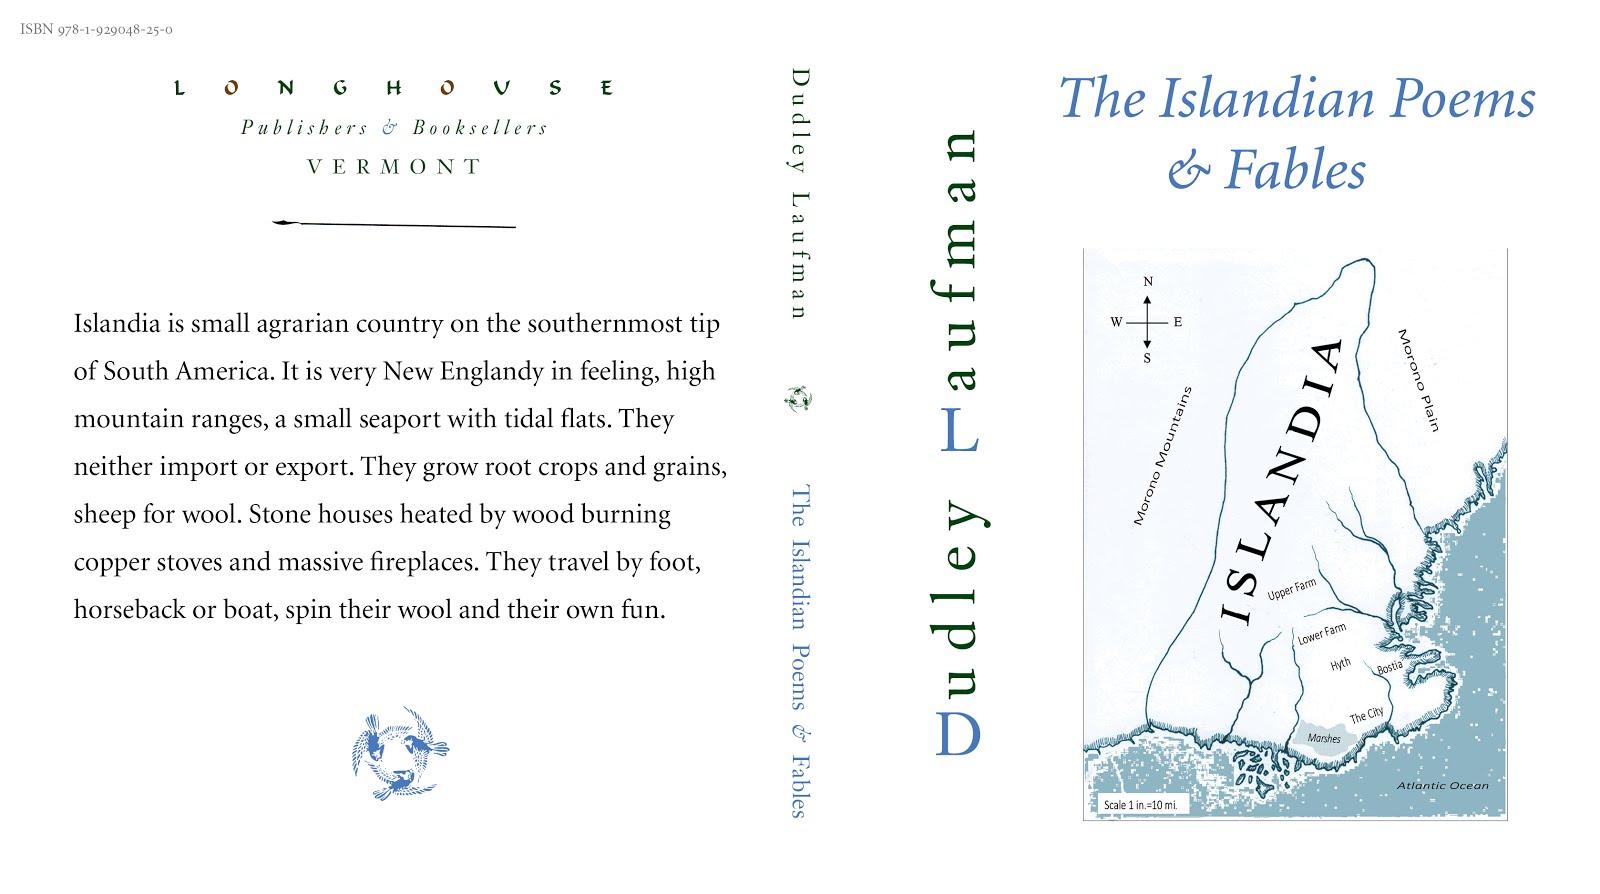 Dudley Laufman's Islandian Poems